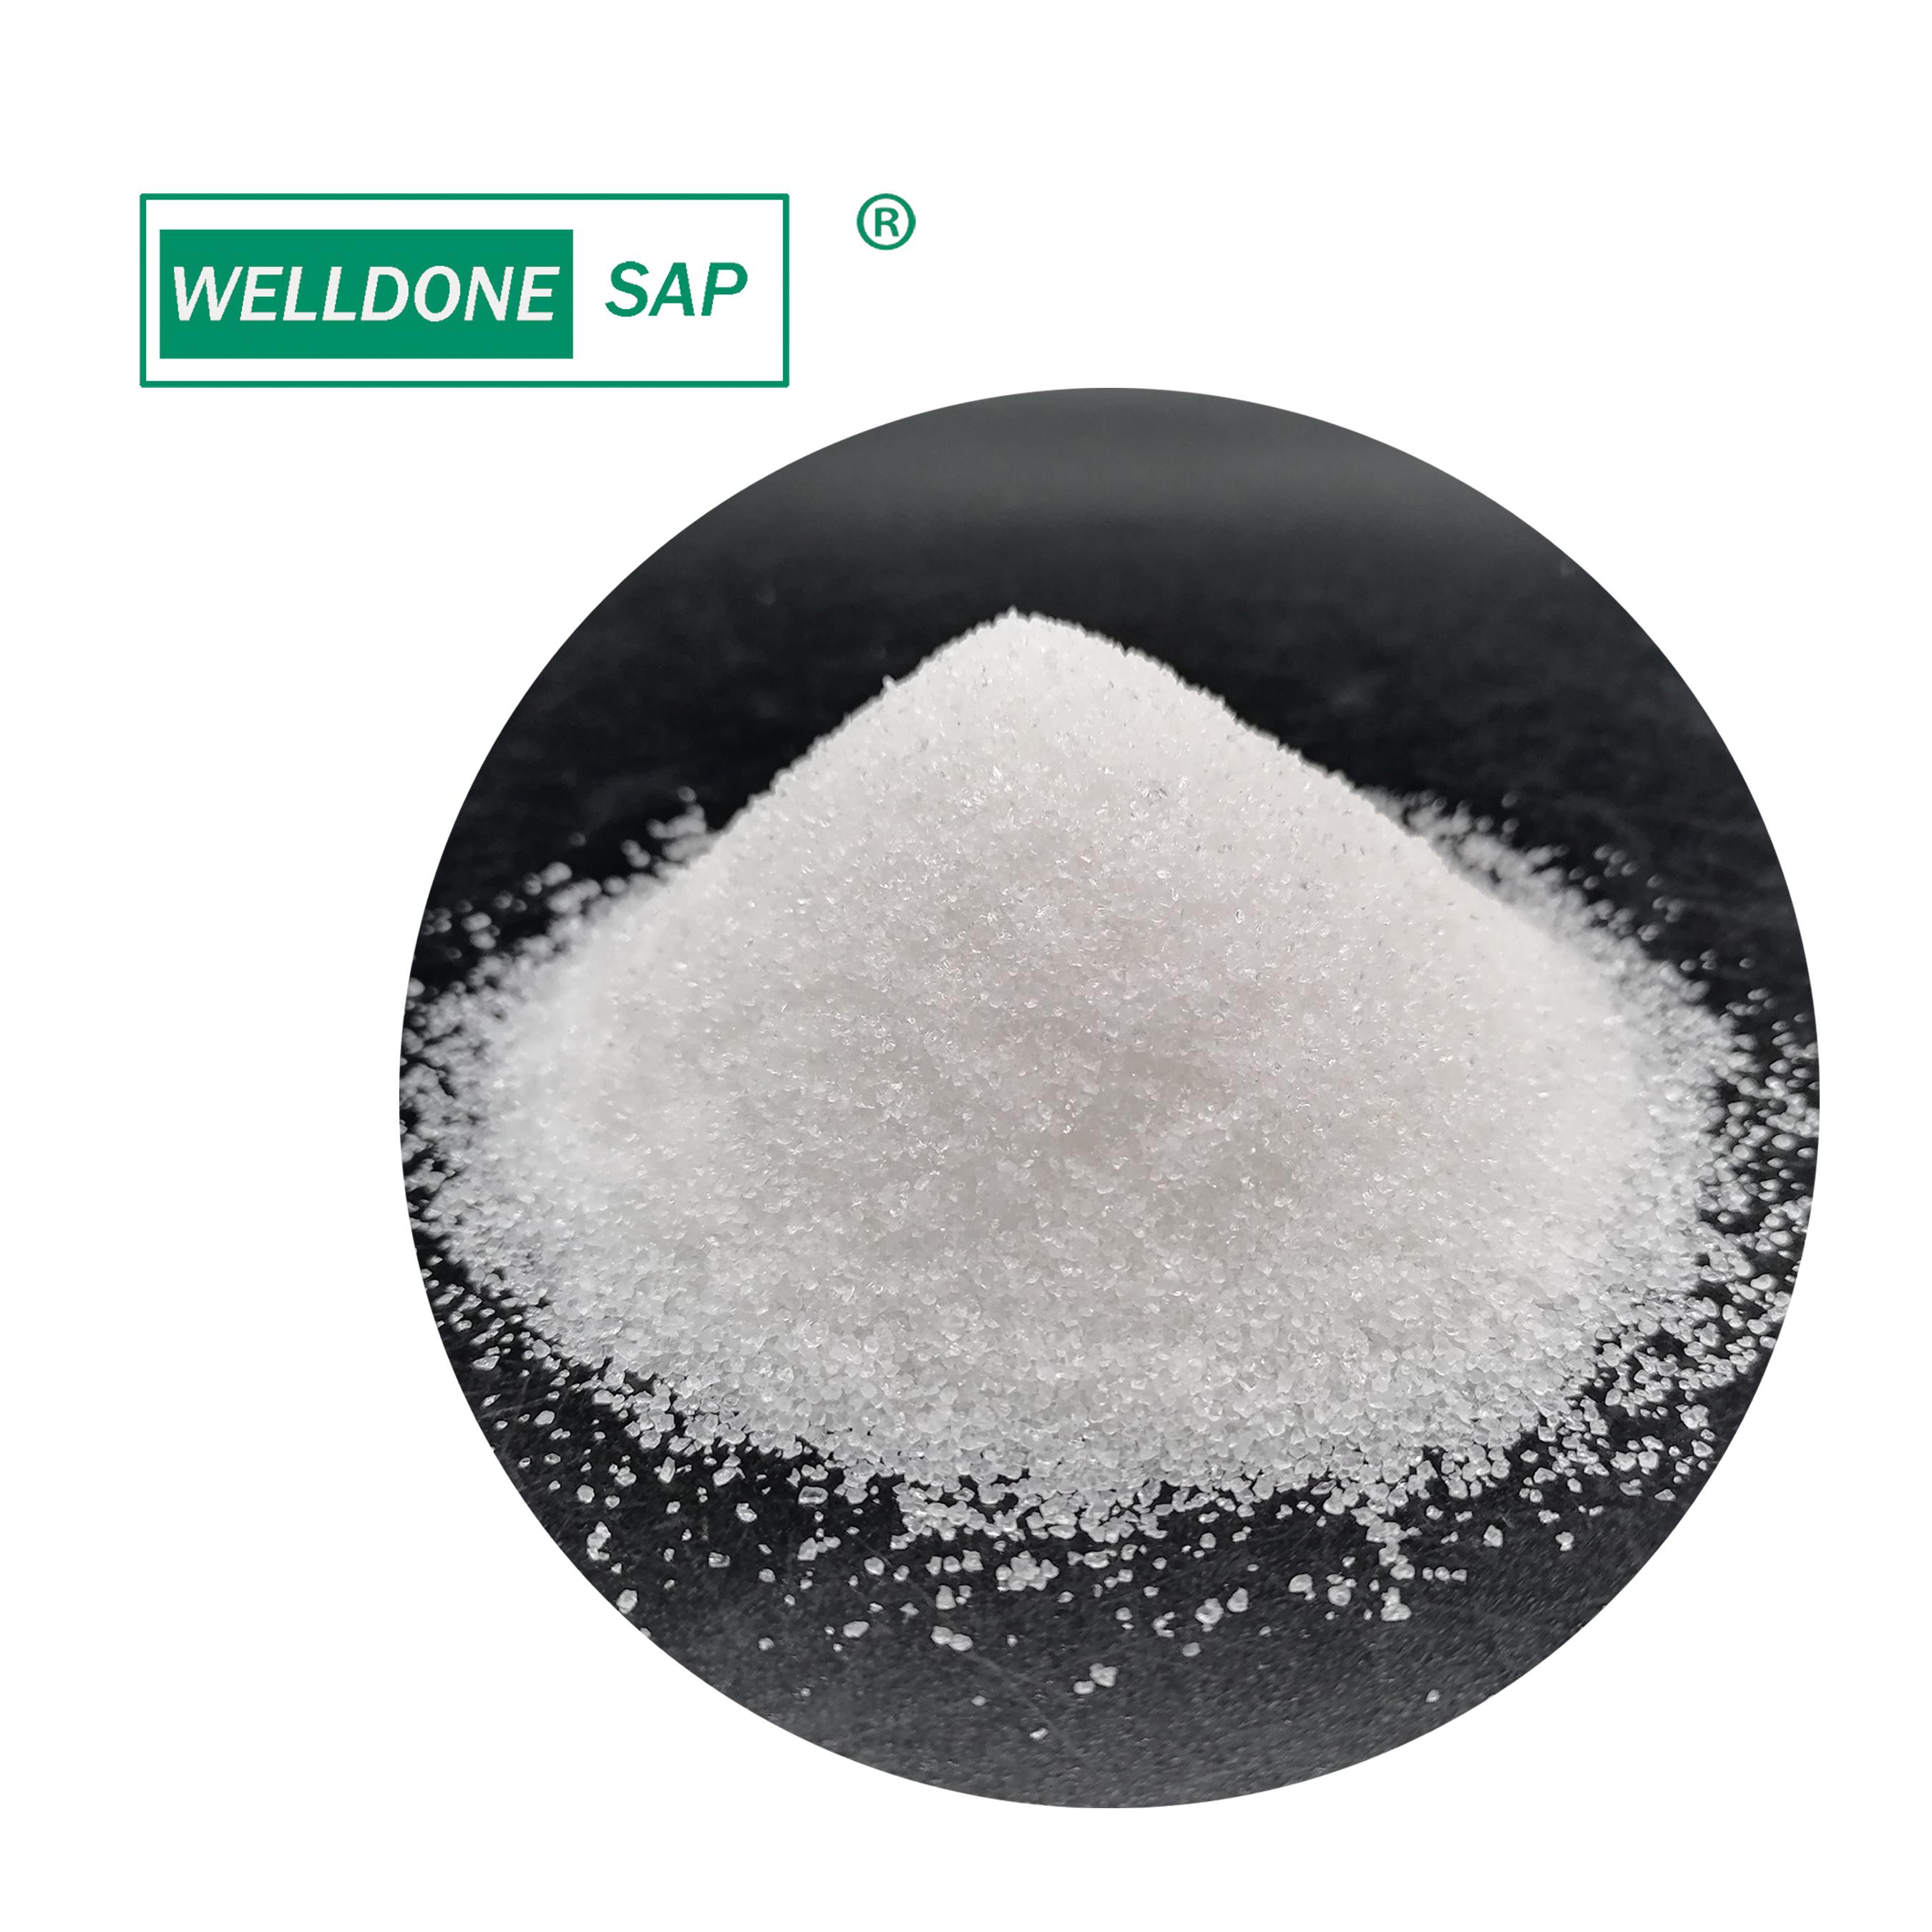 Super absorbent polymer Potassium polyacrylate  for soil